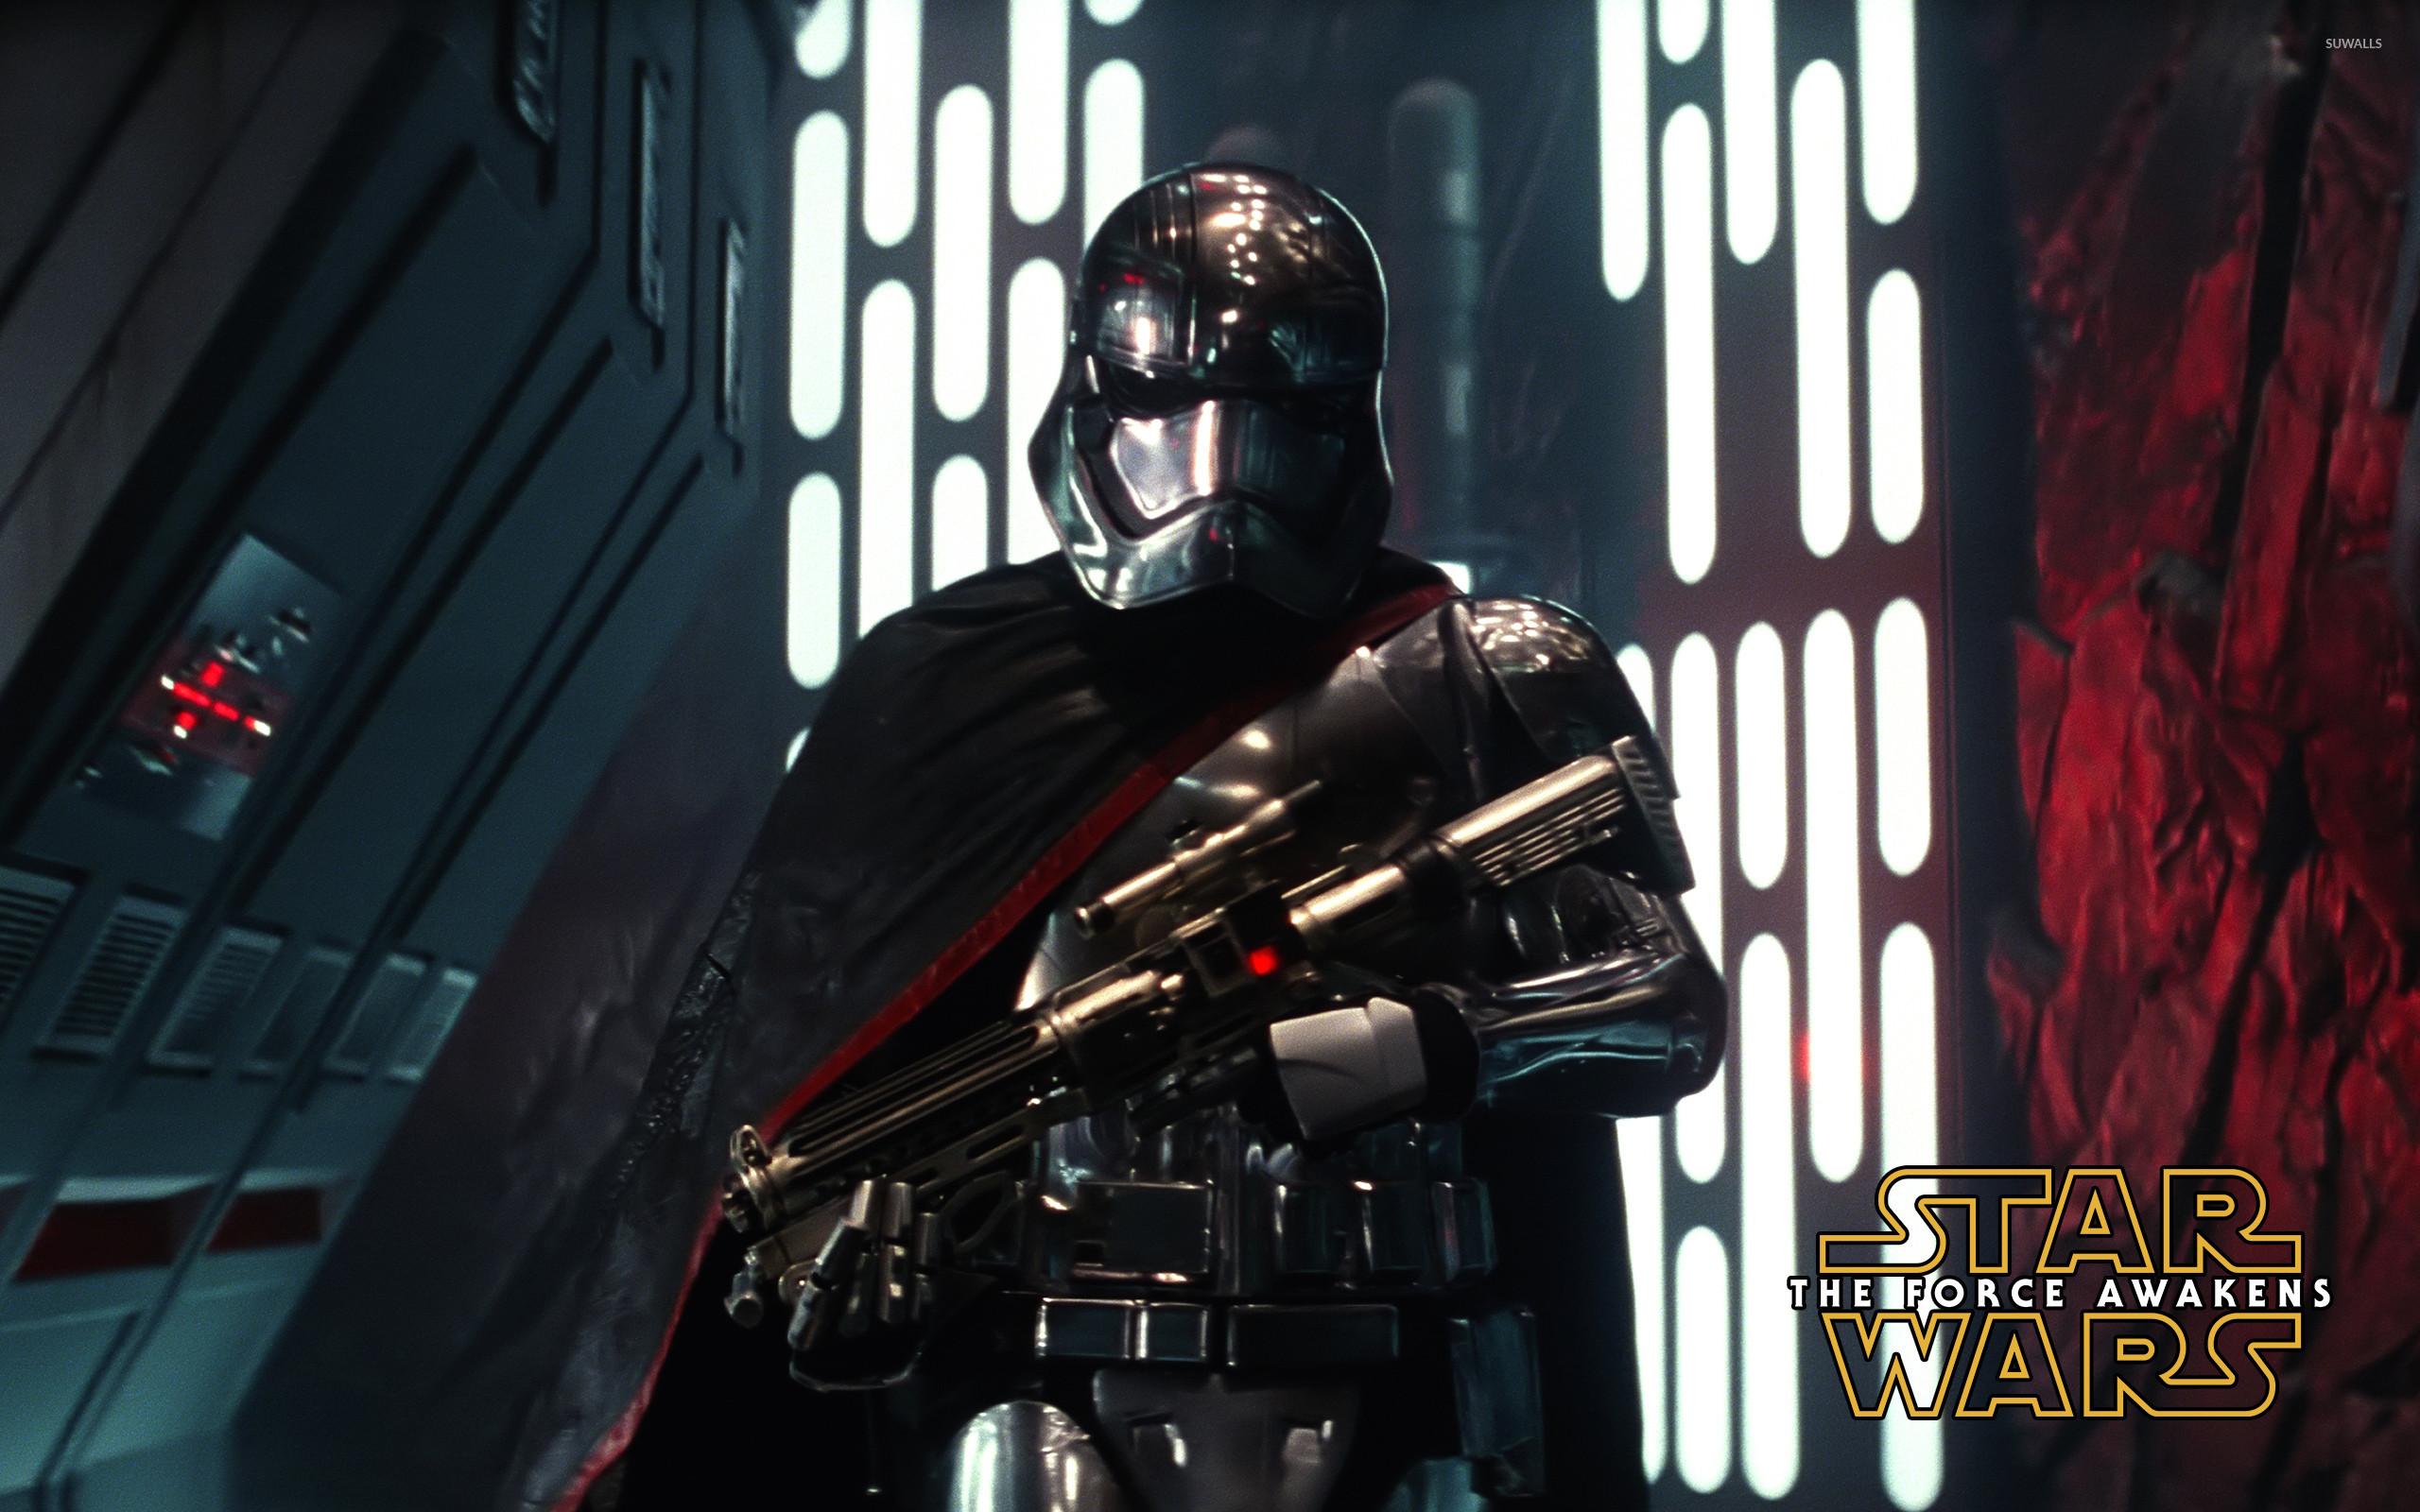 Captain Phasma with a gun – Star Wars: The Force Awakens wallpaper  jpg